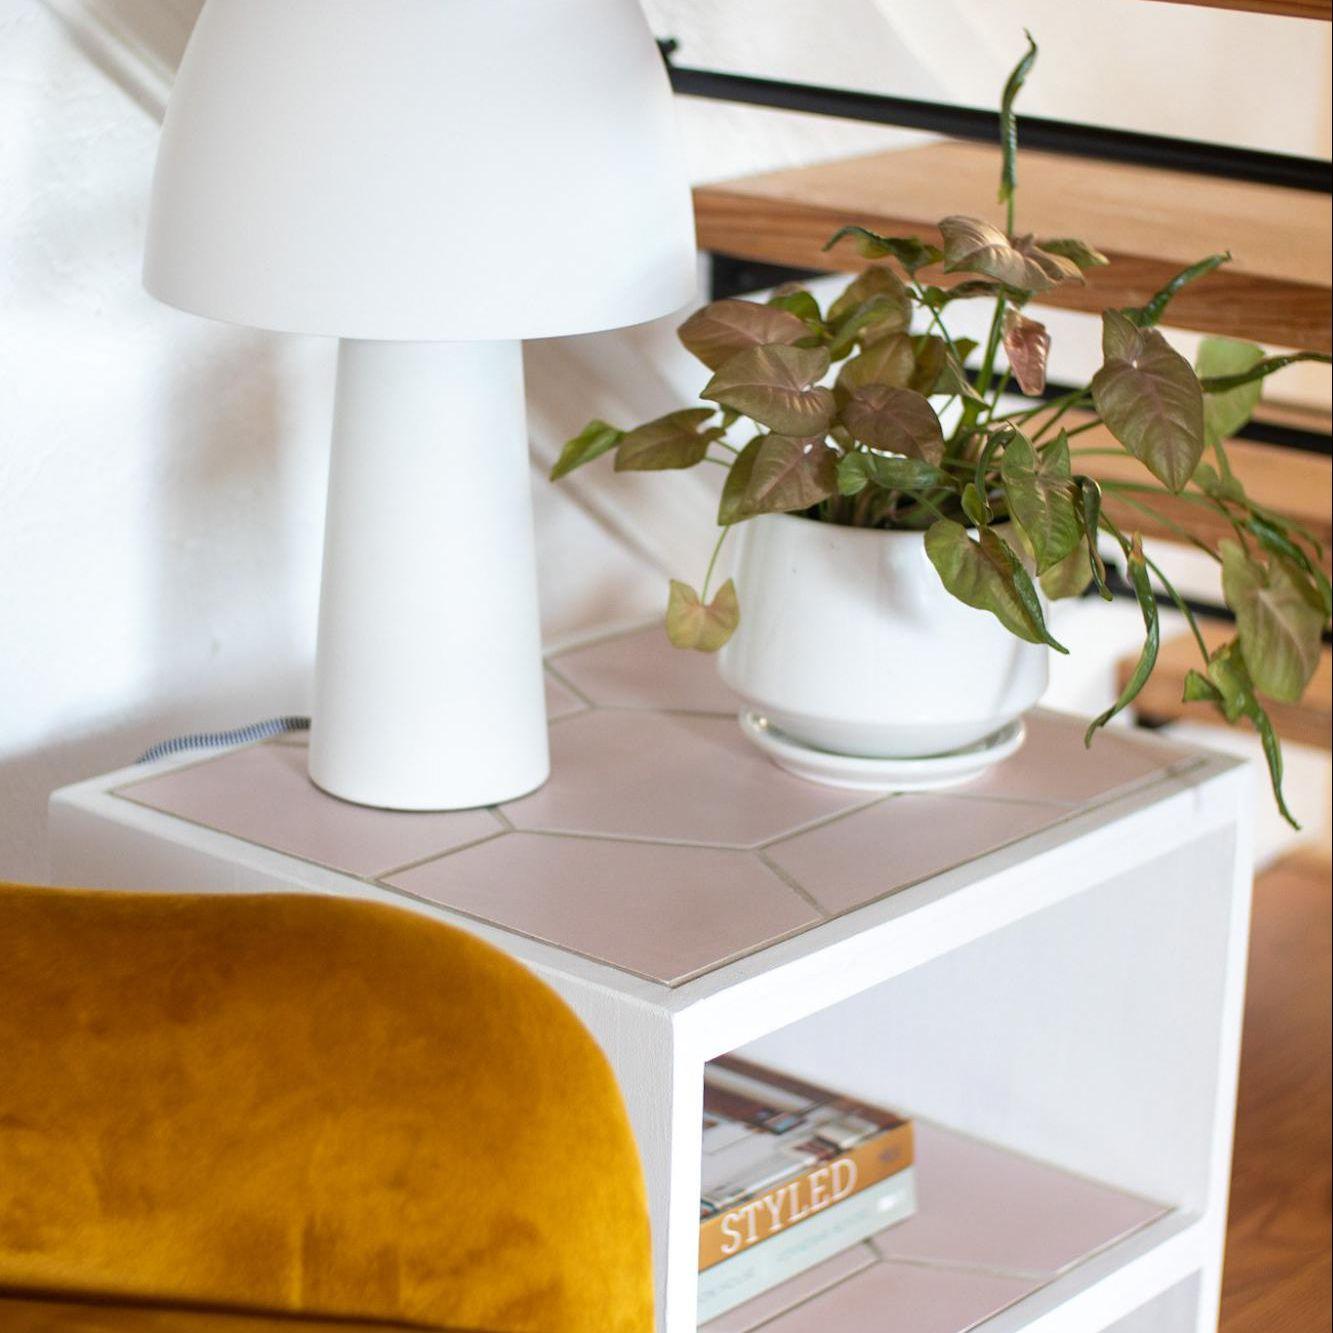 Retro tiled nightstand with mushroom lamp.